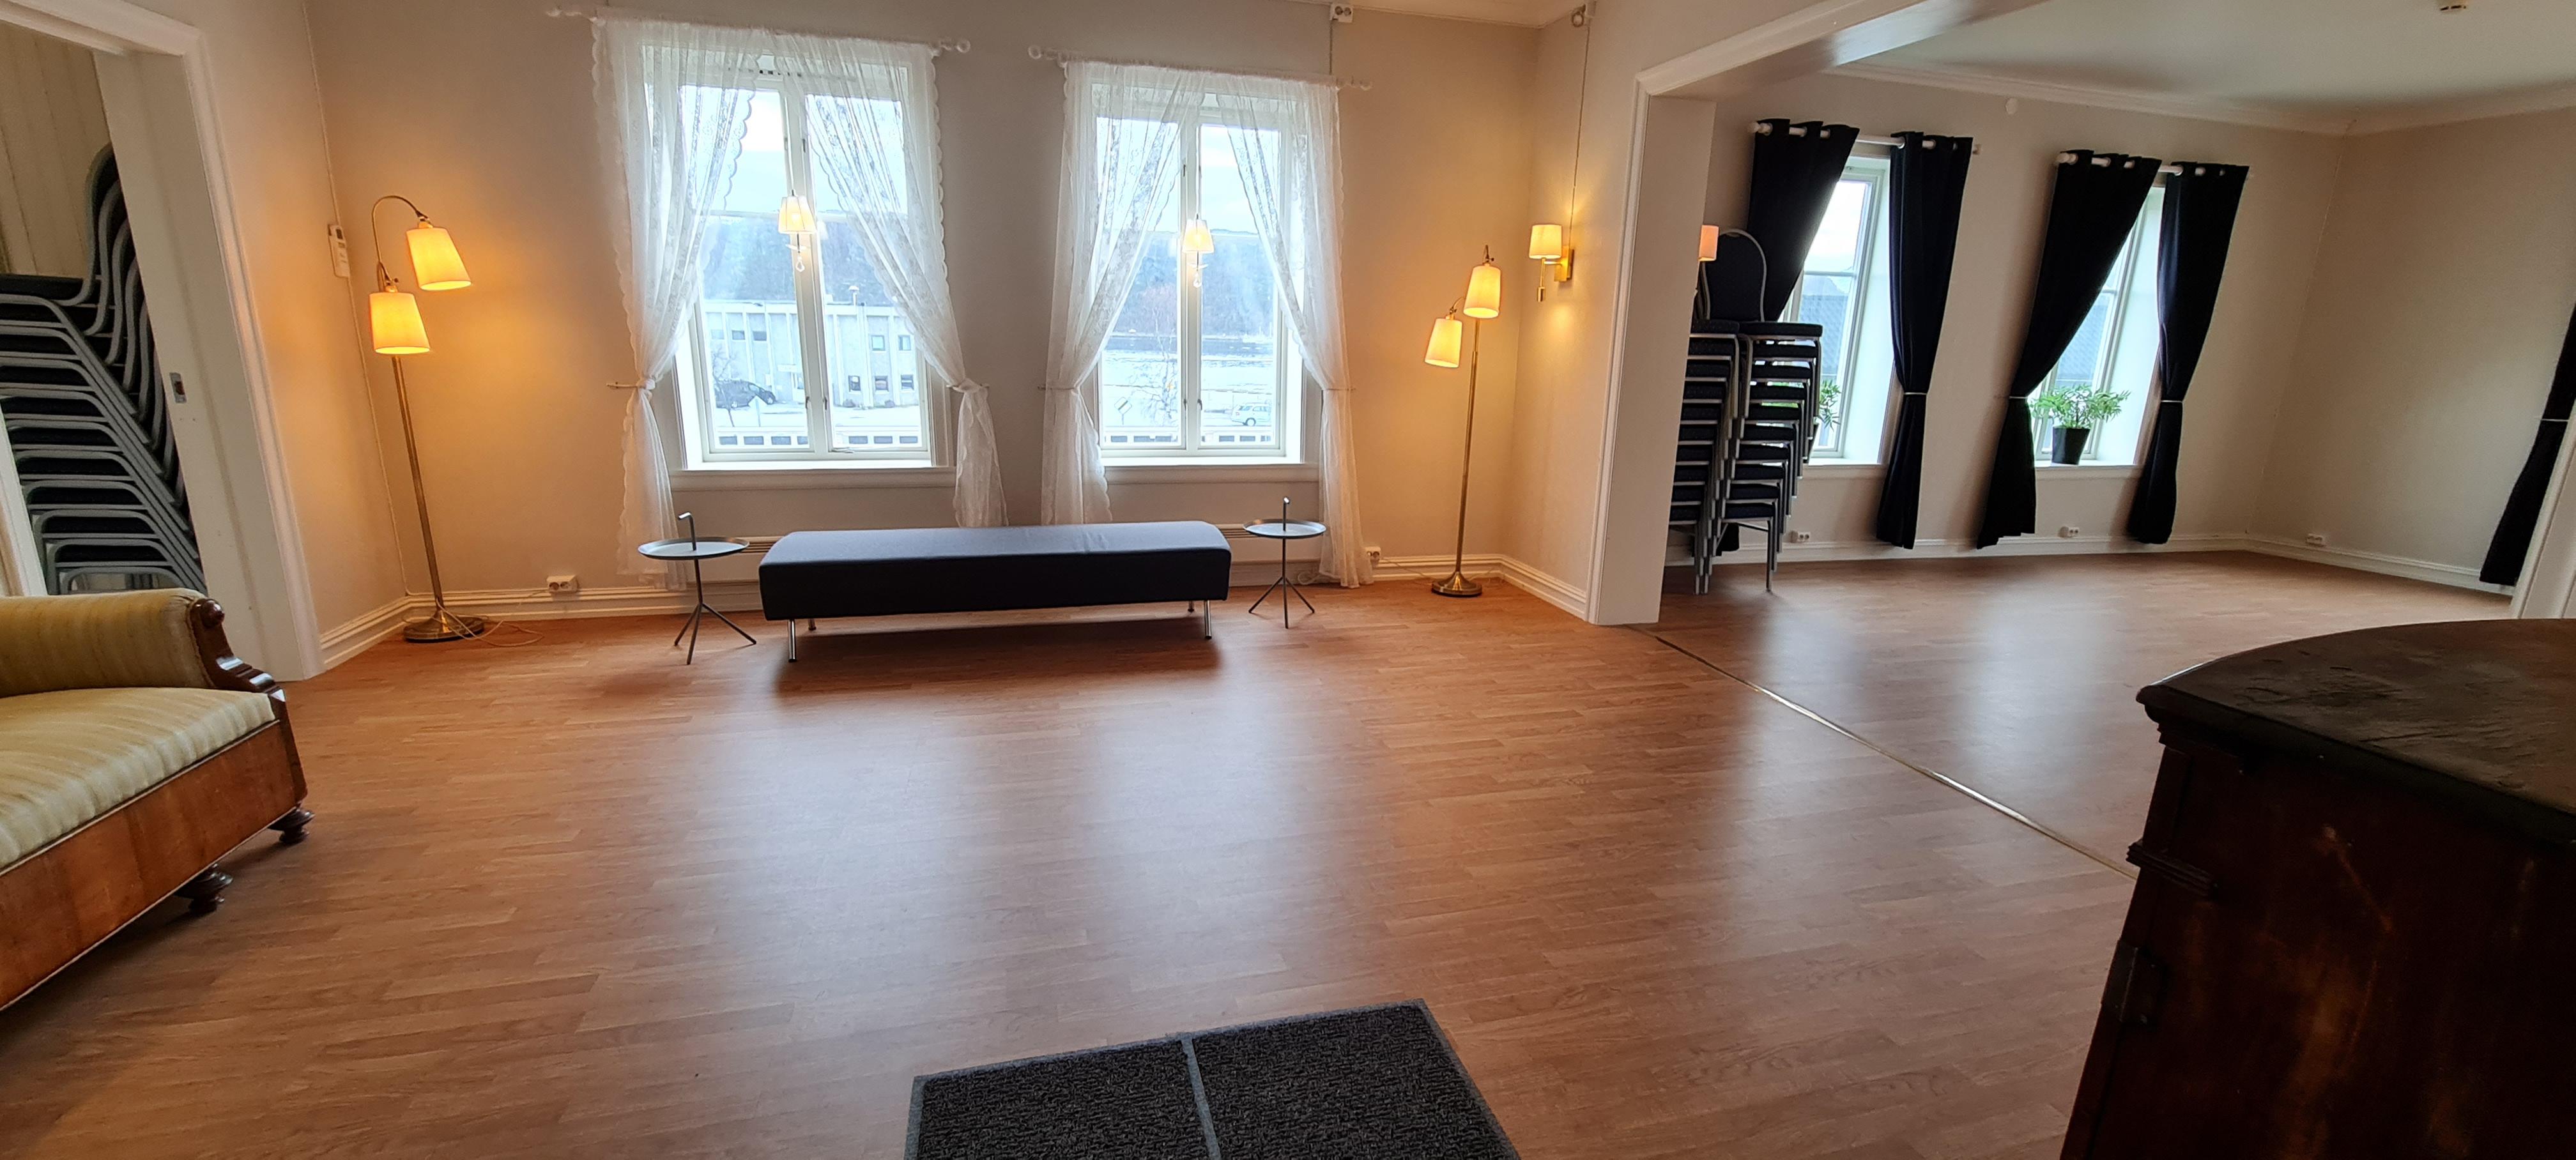 Kiilgården - Stue 4.jpg